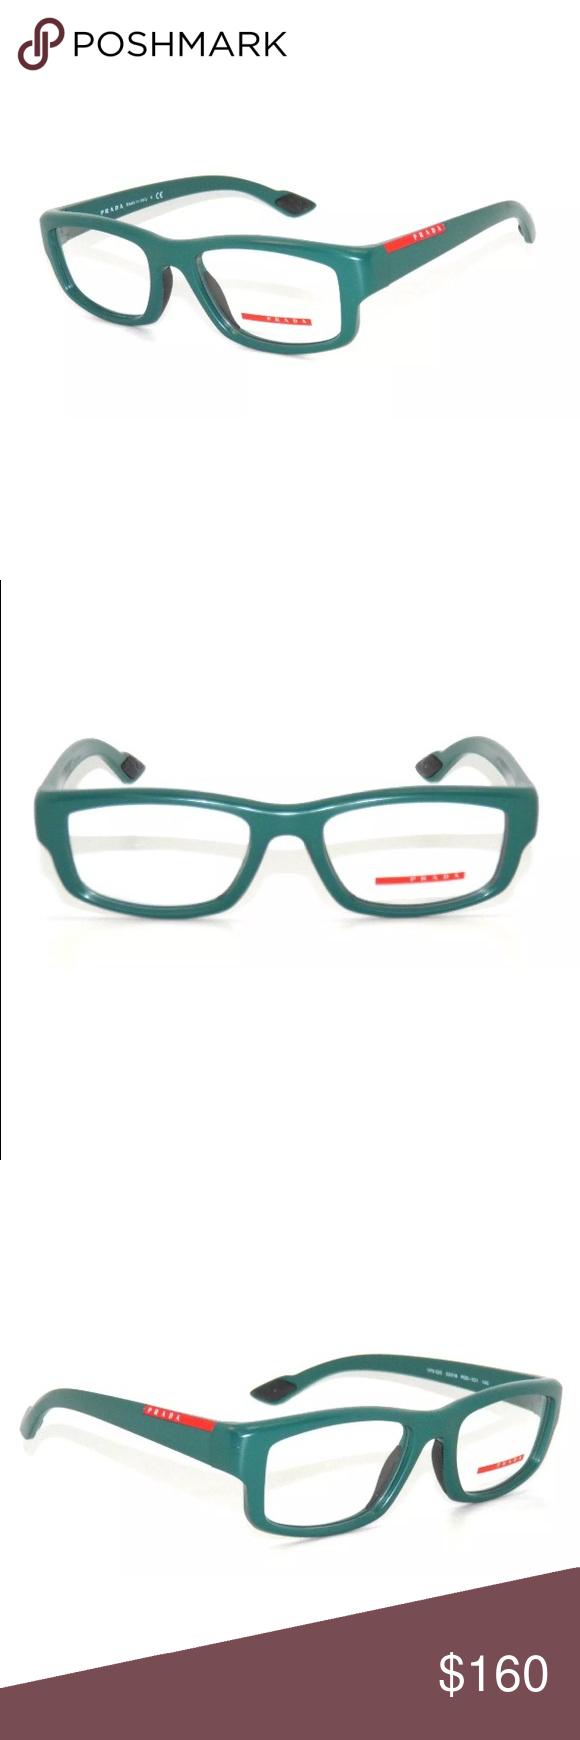 c2ab27c91f1 Prada Sport Glasses 02E Matte Green Frame New with clear lens Comes with  Prada case Authentic Prada Accessories Glasses